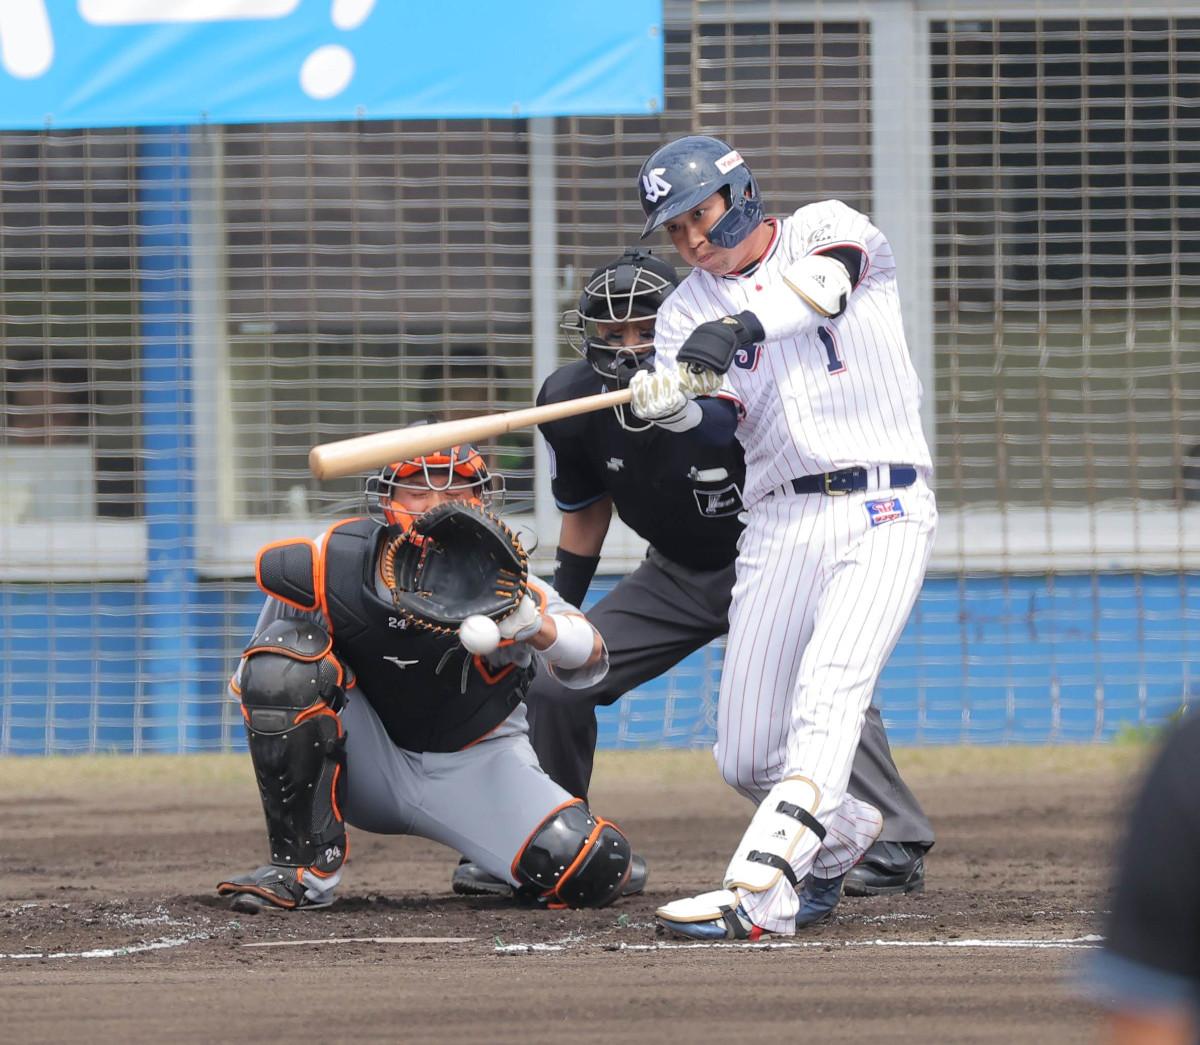 1回2死、山田哲人が左前安打